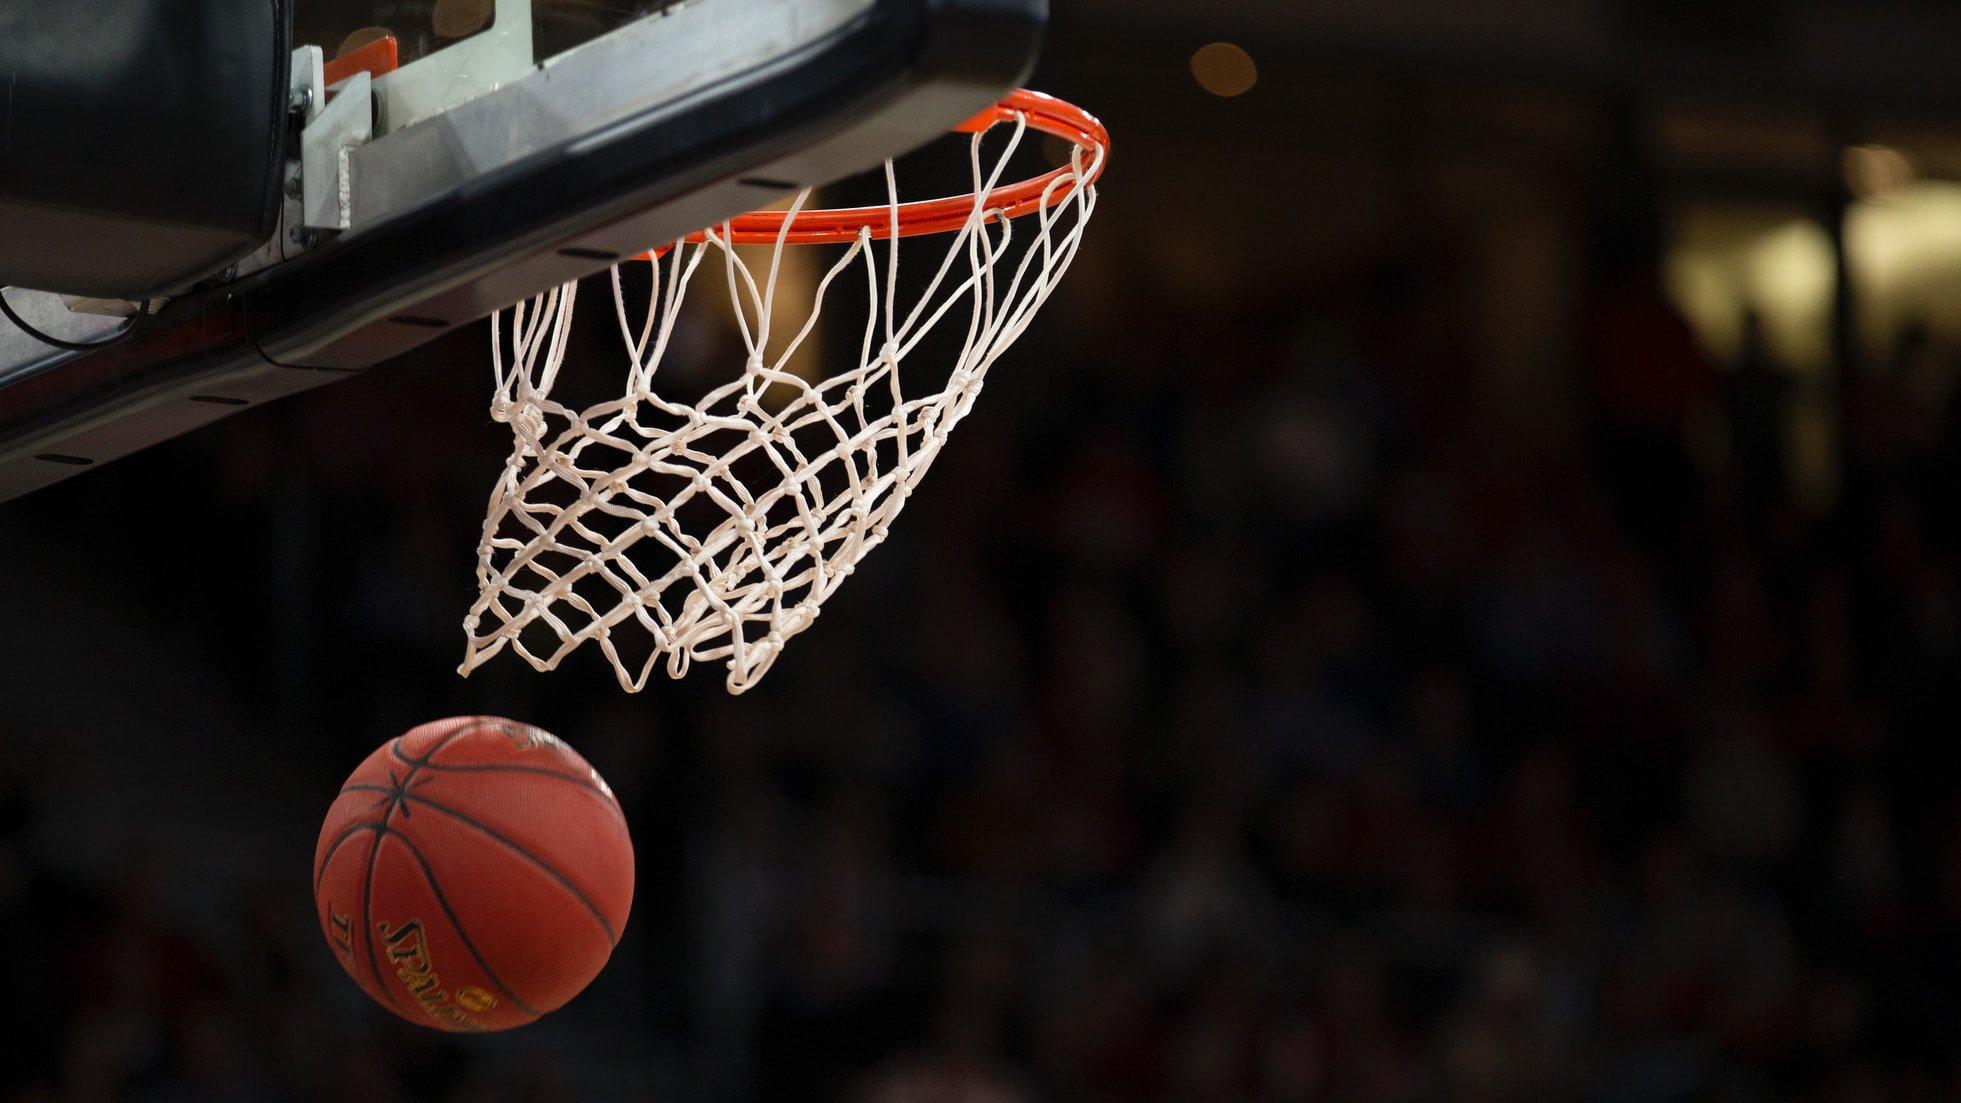 NBA Playoff Odds: Atlanta Hawks vs Milwaukee Bucks Game 2 Preview